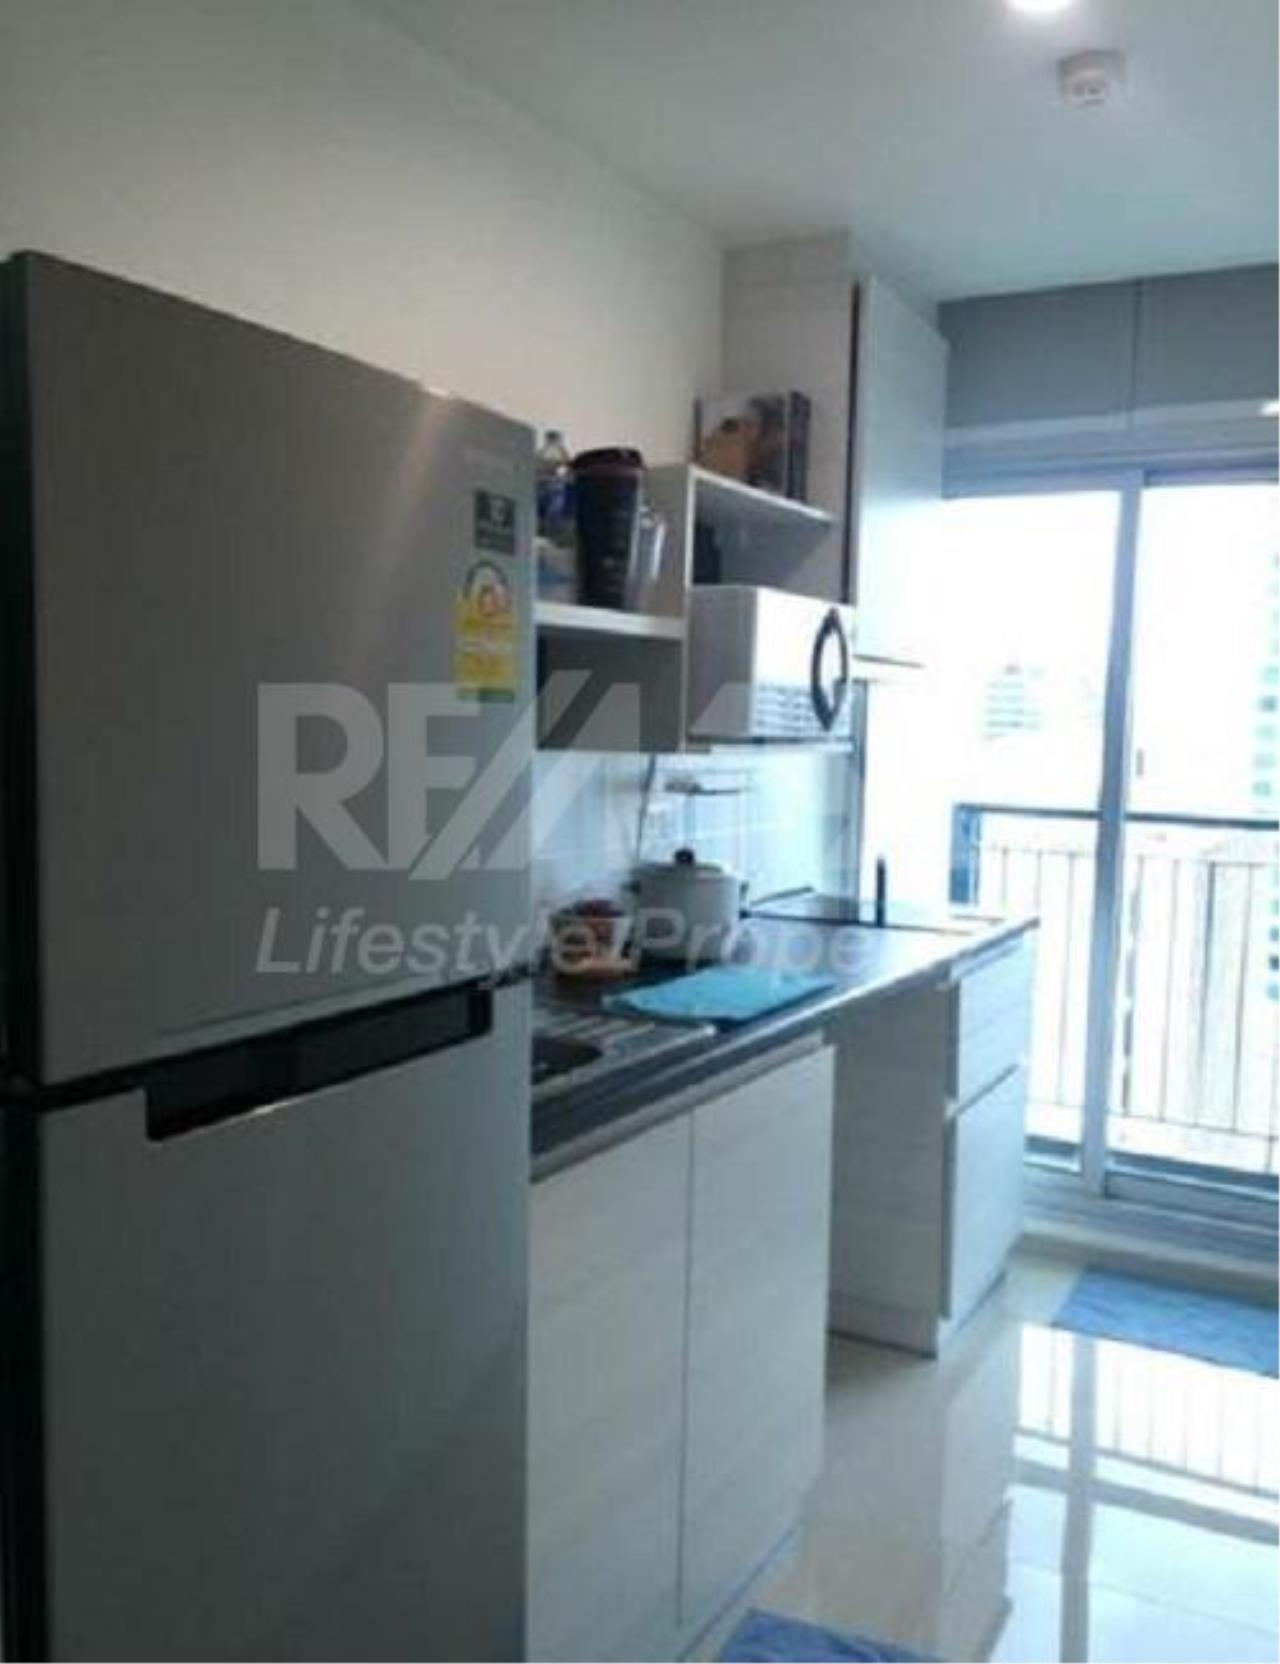 RE/MAX LifeStyle Property Agency's Life Ratchadapisek 6